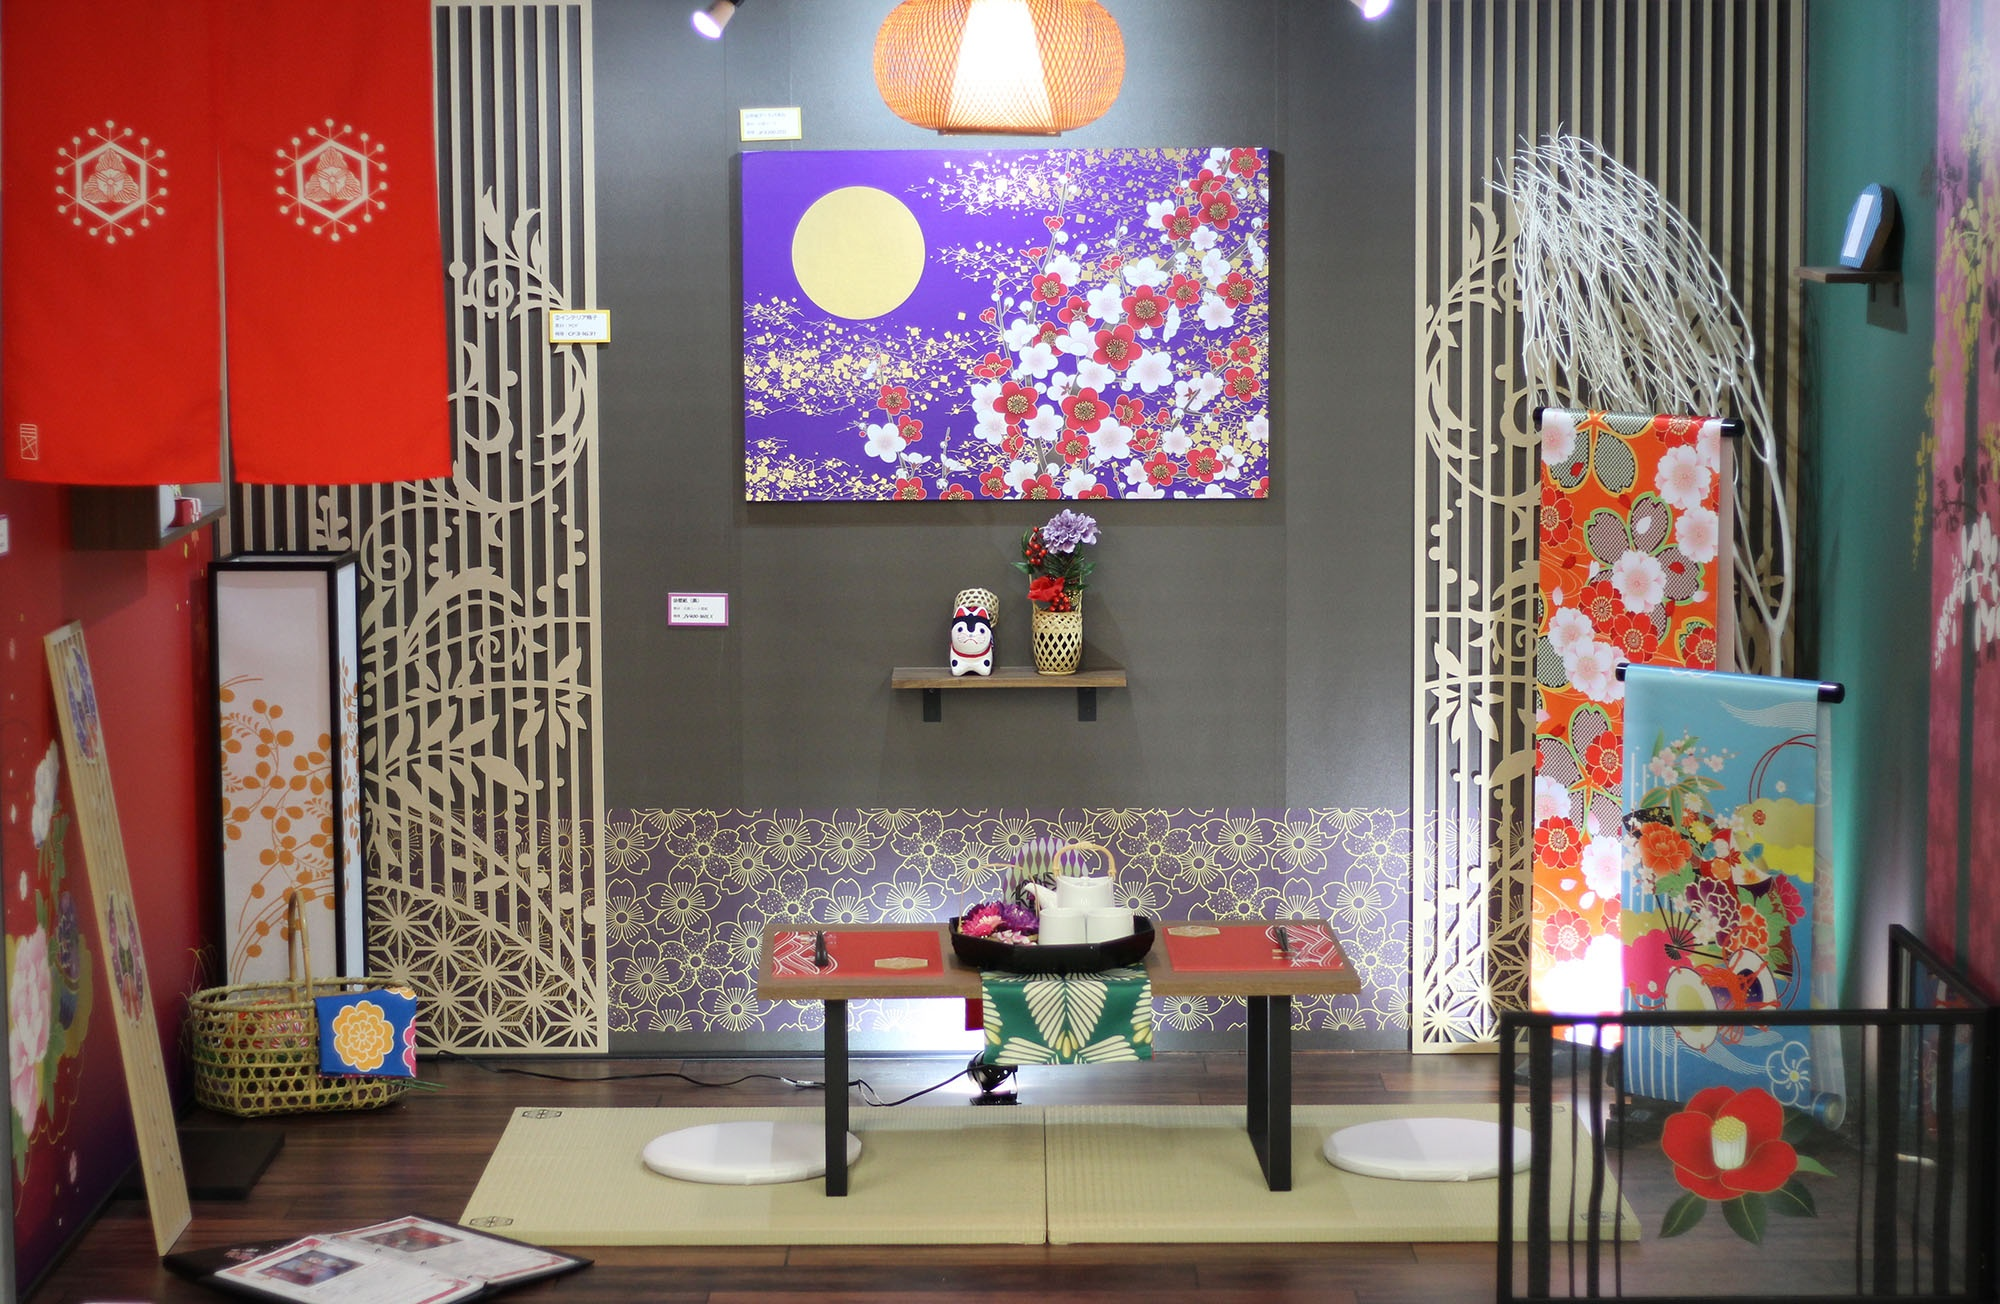 Japanese‐style room interior